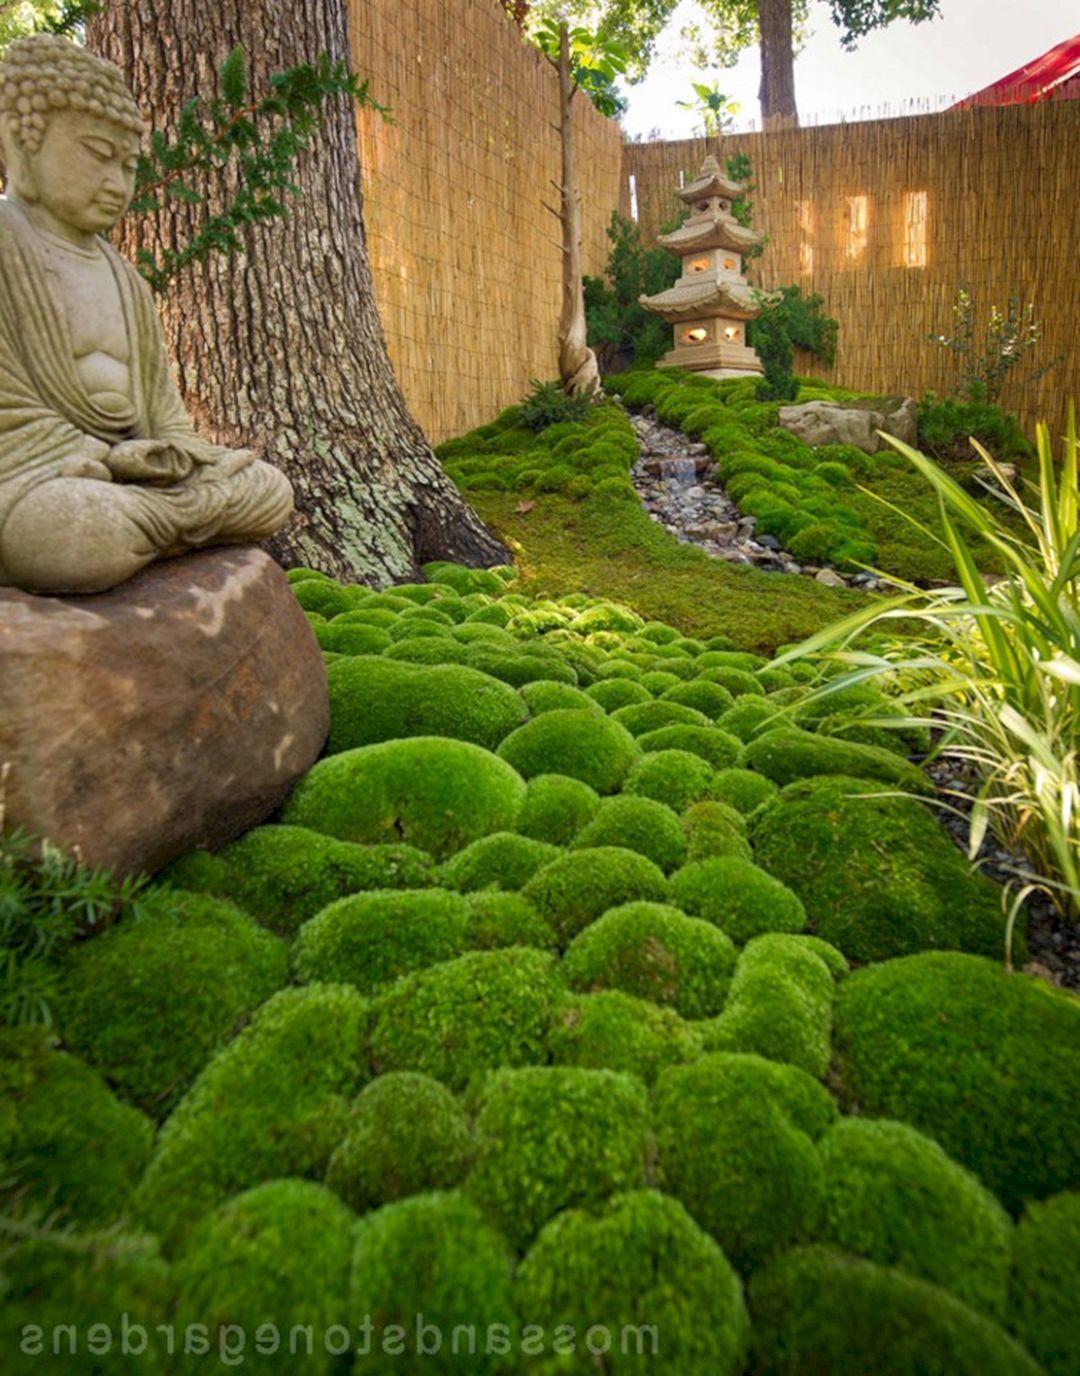 Top 10 Beautiful Zen Garden Ideas For Backyard | Zen ... on Zen Garden Backyard Ideas id=31668